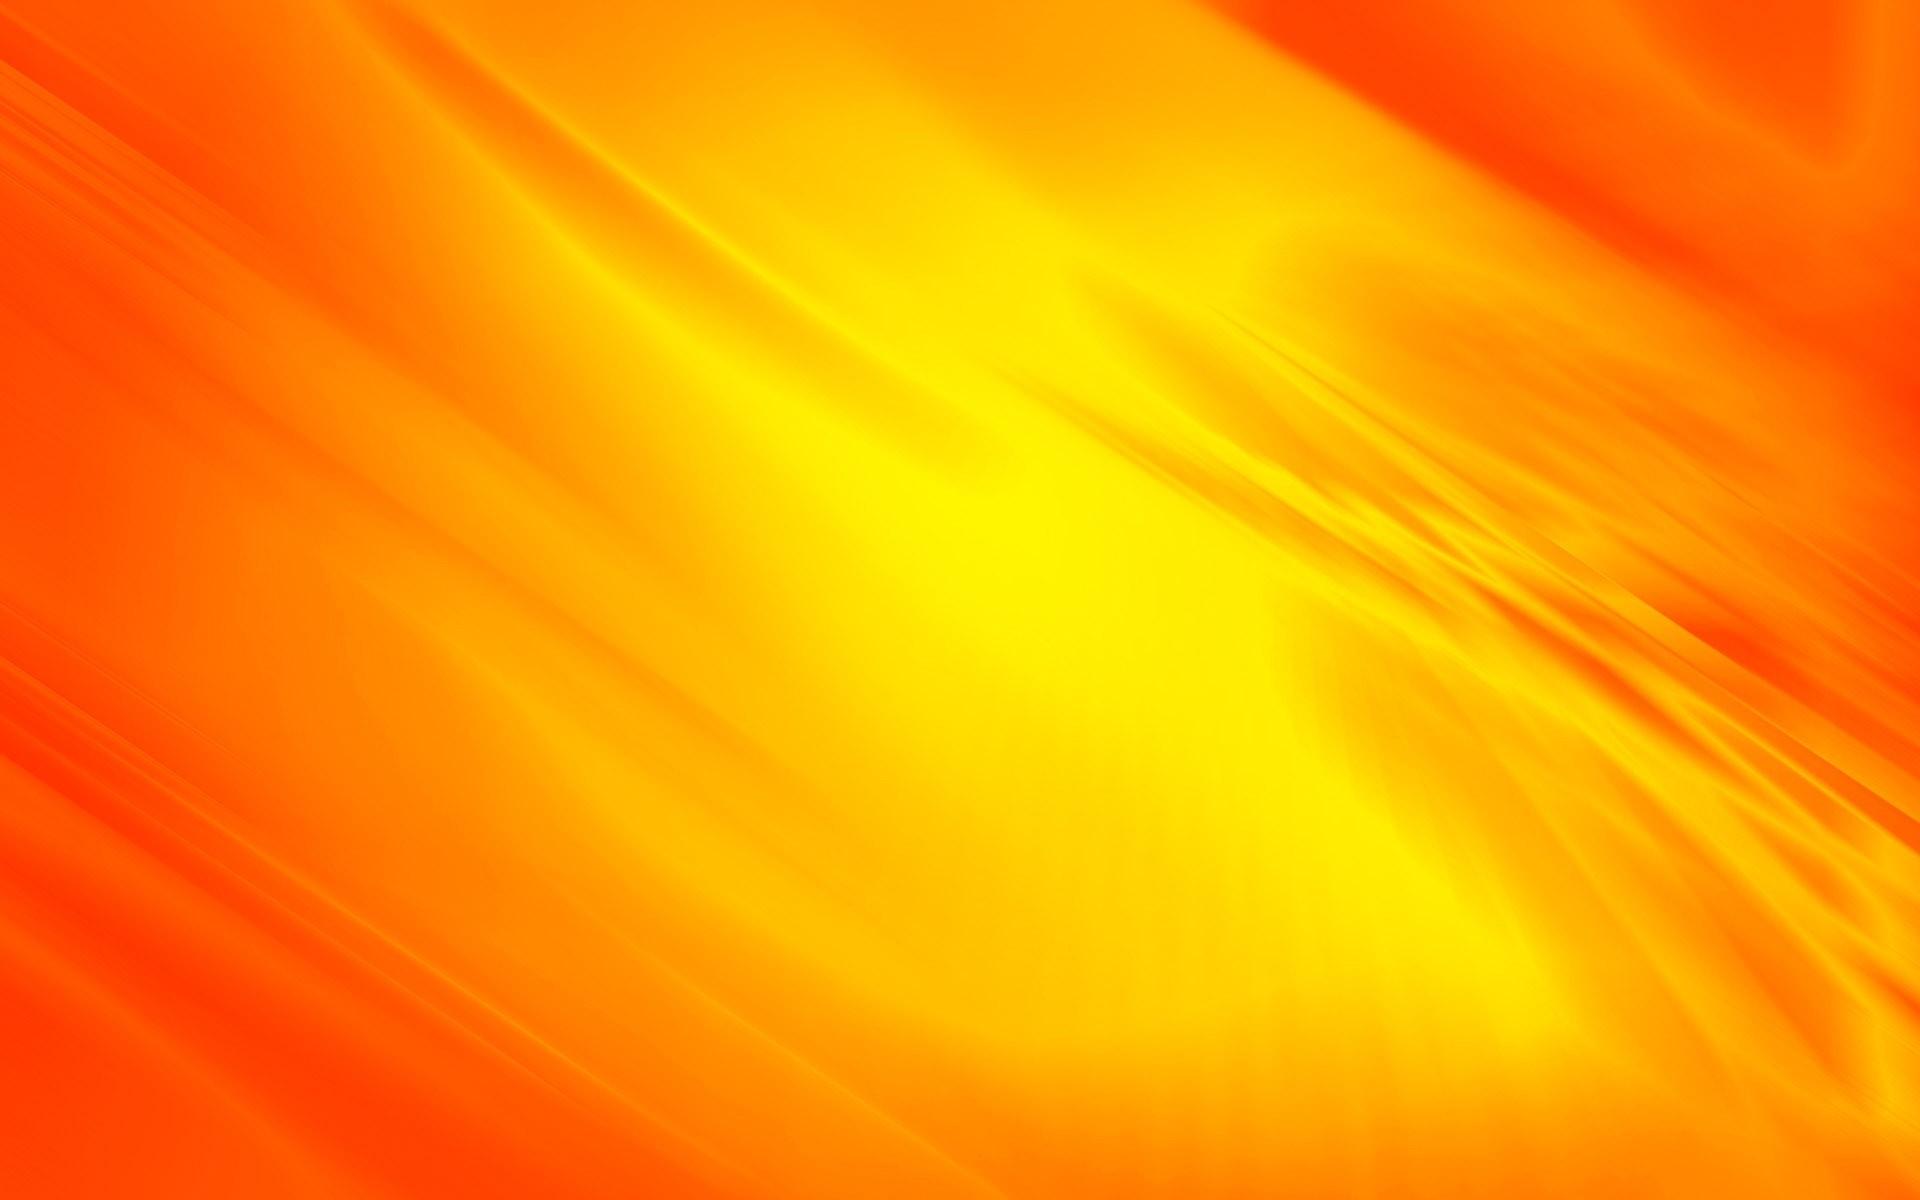 Yellow Orange Flowing Curves Wallpaper Orange And Yellow